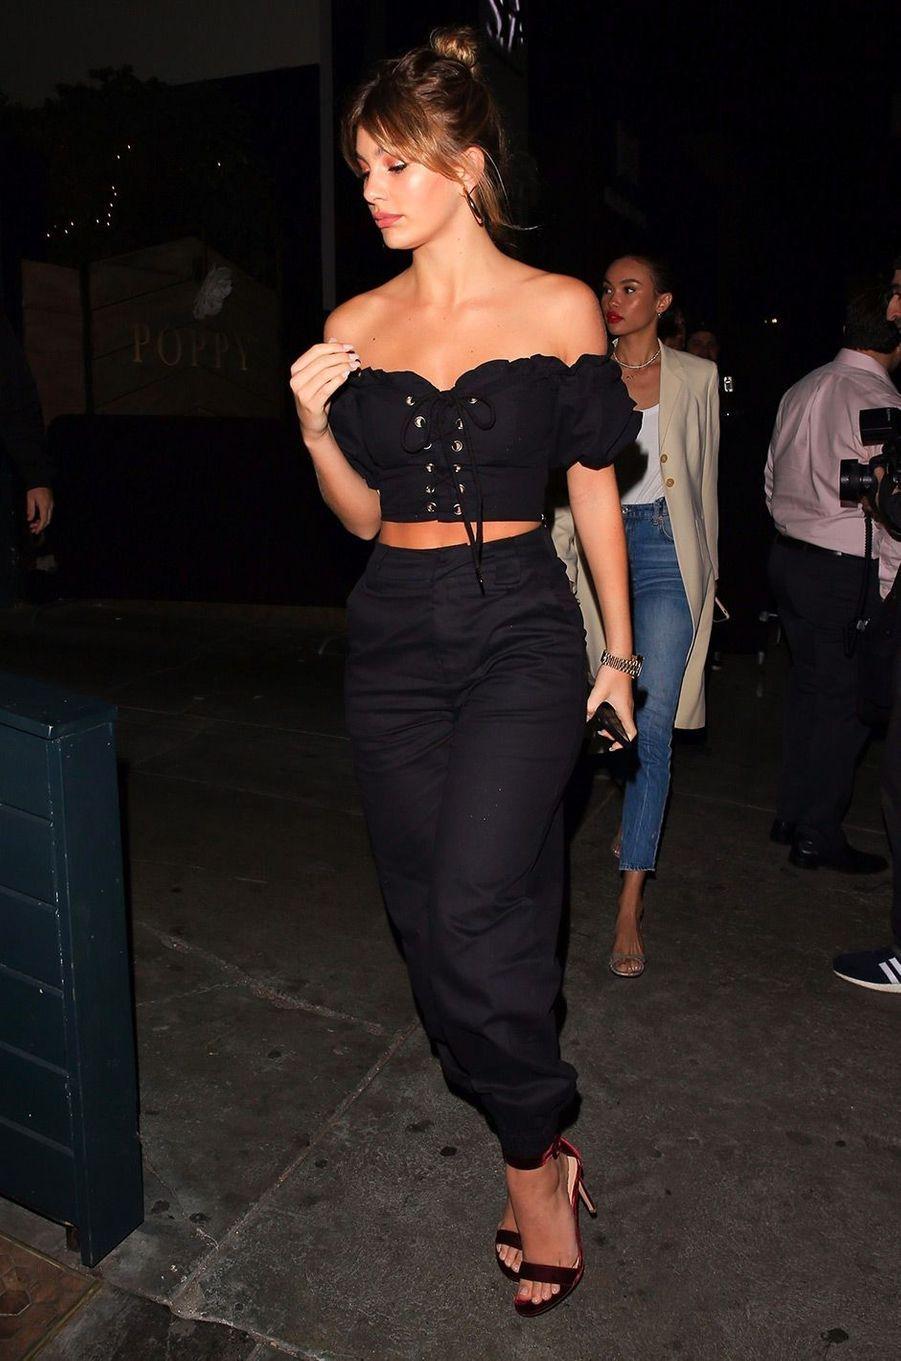 Camila Morrone arriveà l'anniversaire de Kendall Jenner